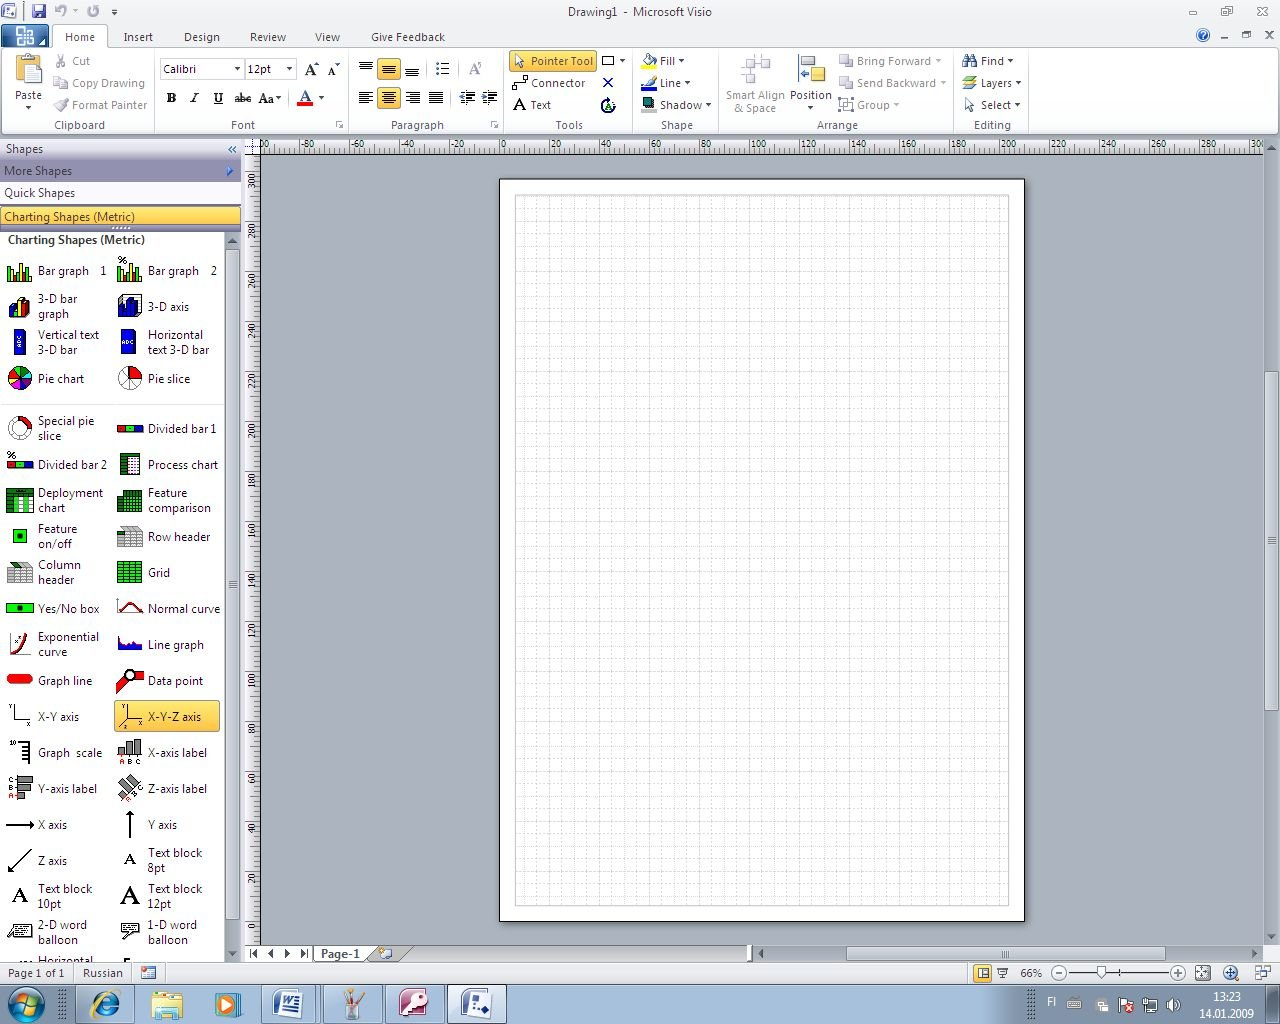 Microsoft Office 14 – Visio